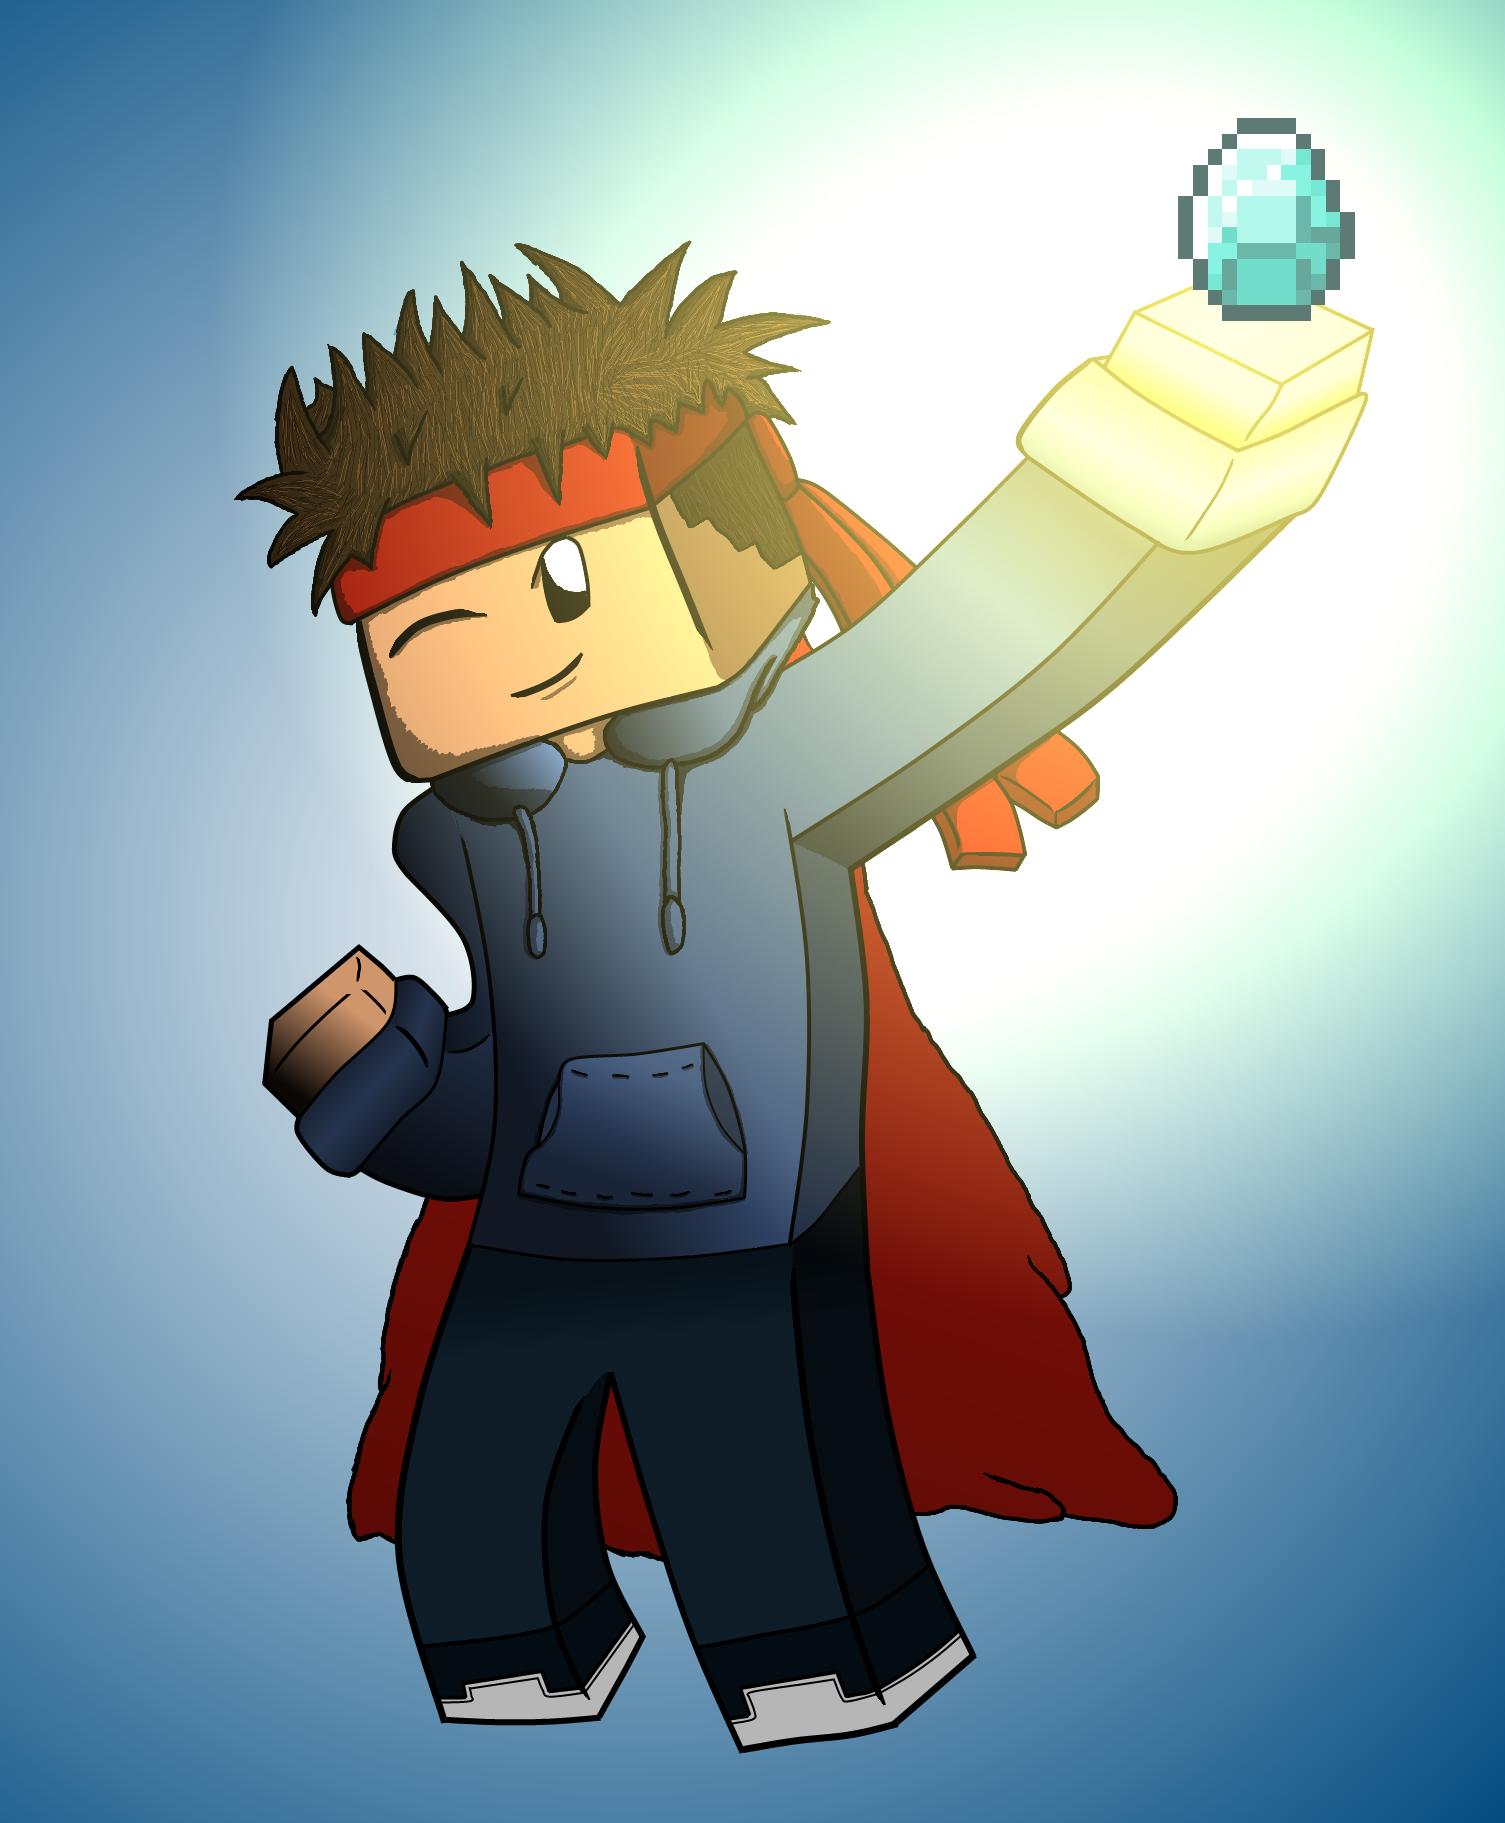 James Cameron S Avatar Logo: My Personal Drawn Minecraft Avatar By Damnthatsmatt On